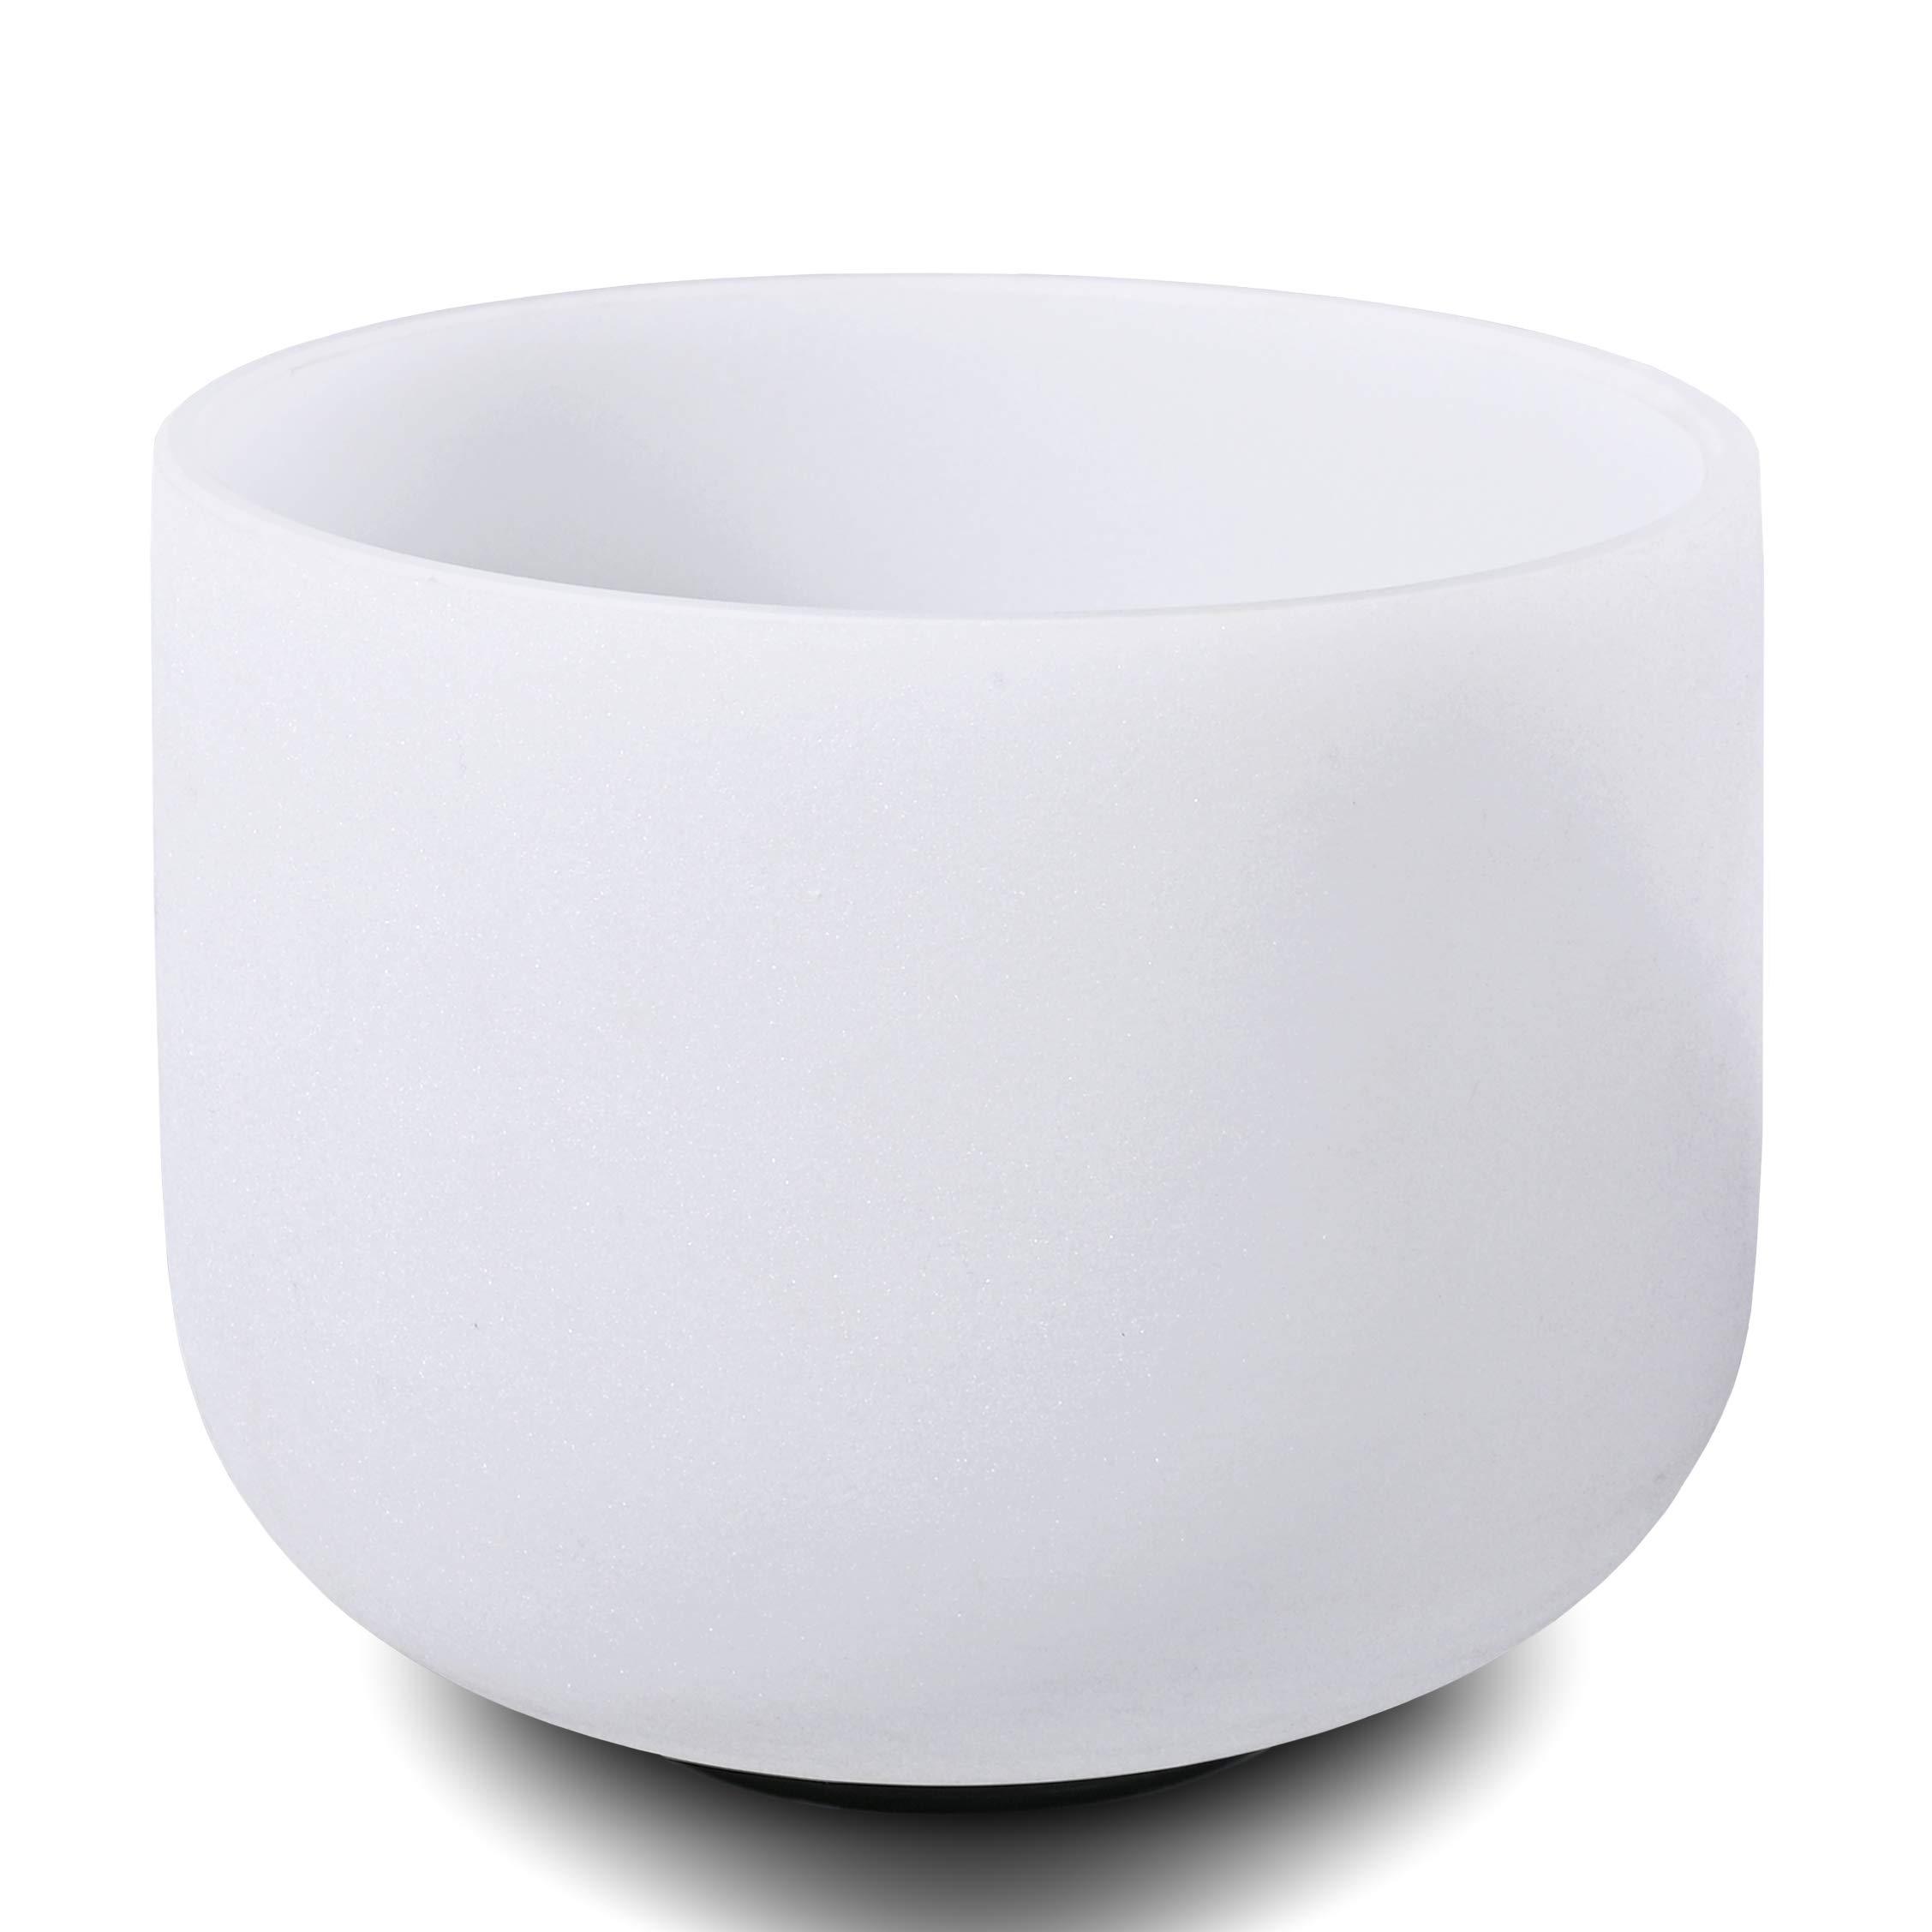 CVNC 10'' Singing Bowl B Note Crown Chakra Frosted Quartz Crystal Singing Bowl + Mallet & O-ring Sound Healing Instrument